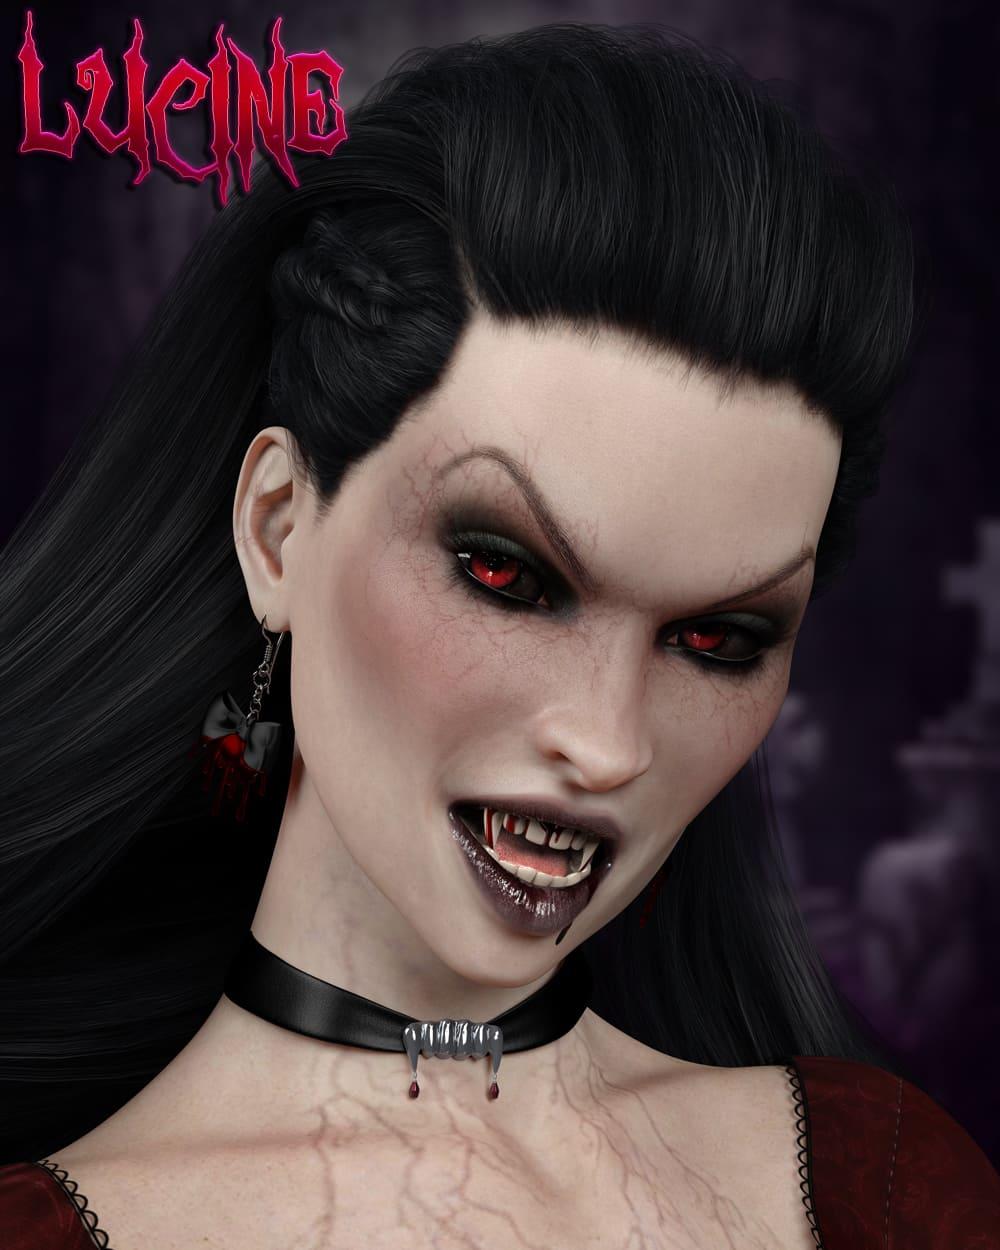 Lucine for Genesis 8 Female_DAZ3D下载站